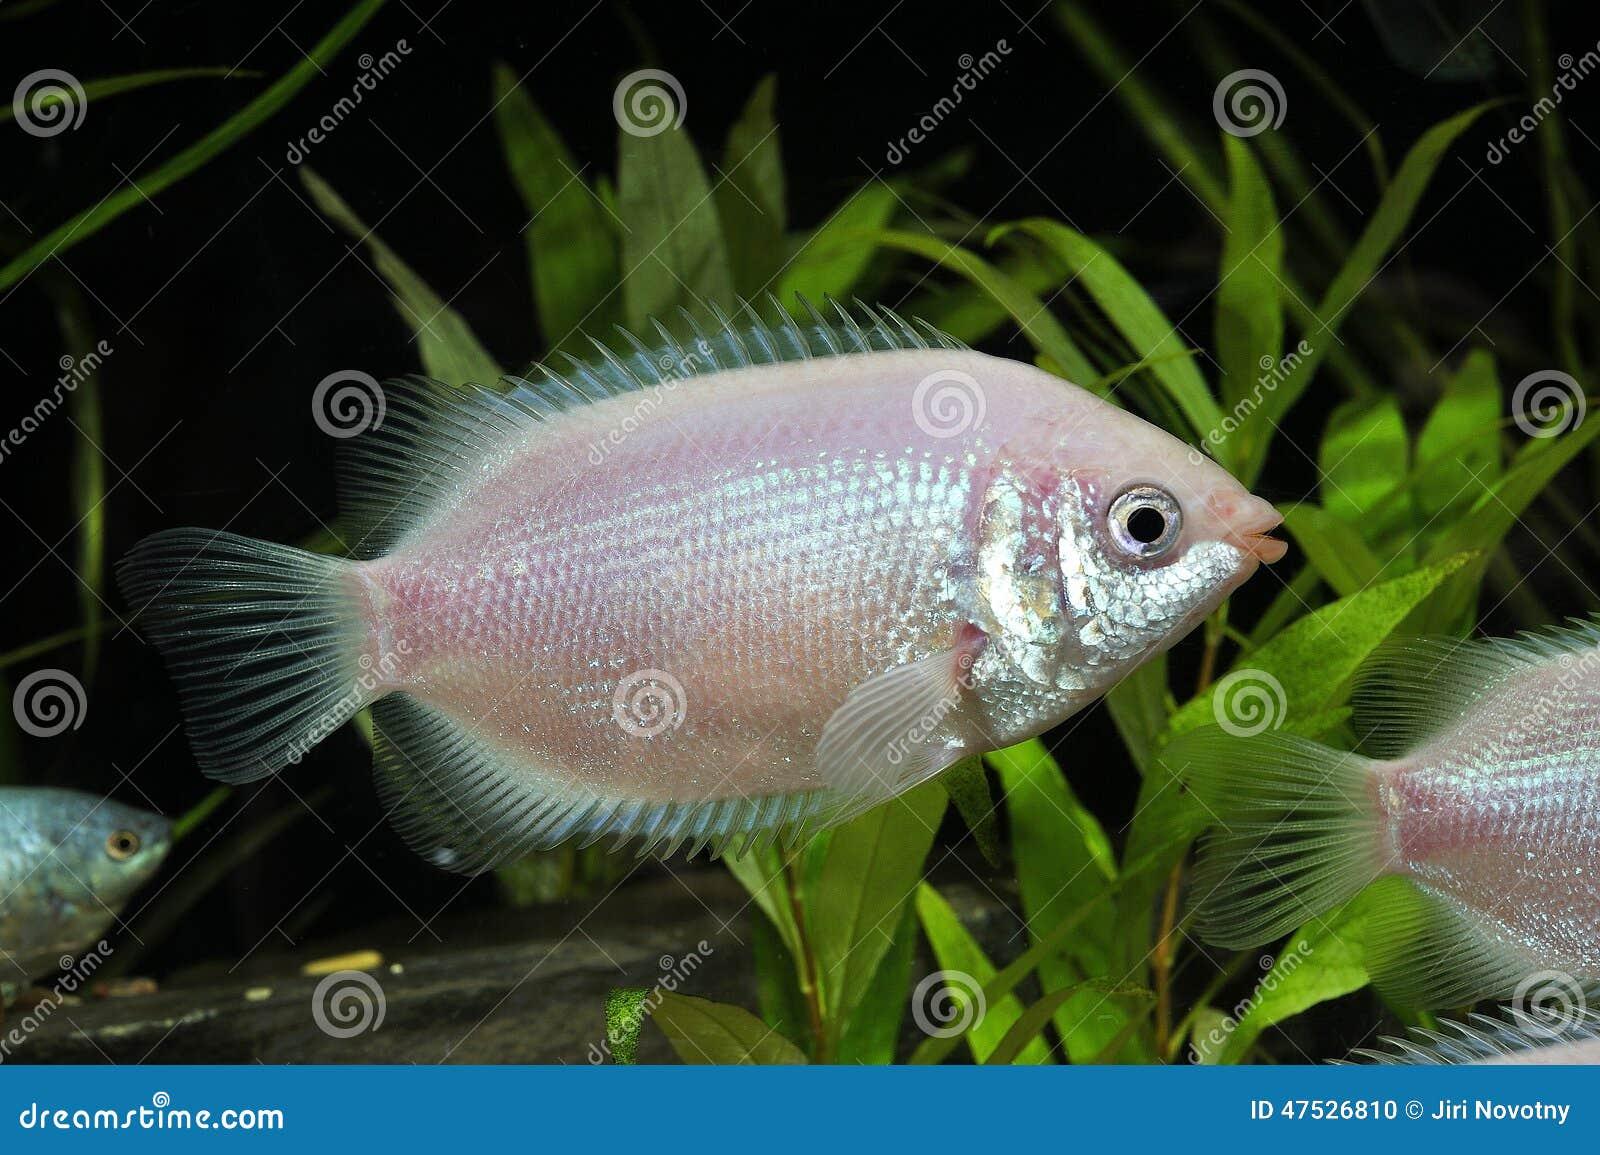 tropical-fish-small-pink-aquarium-47526810.jpg